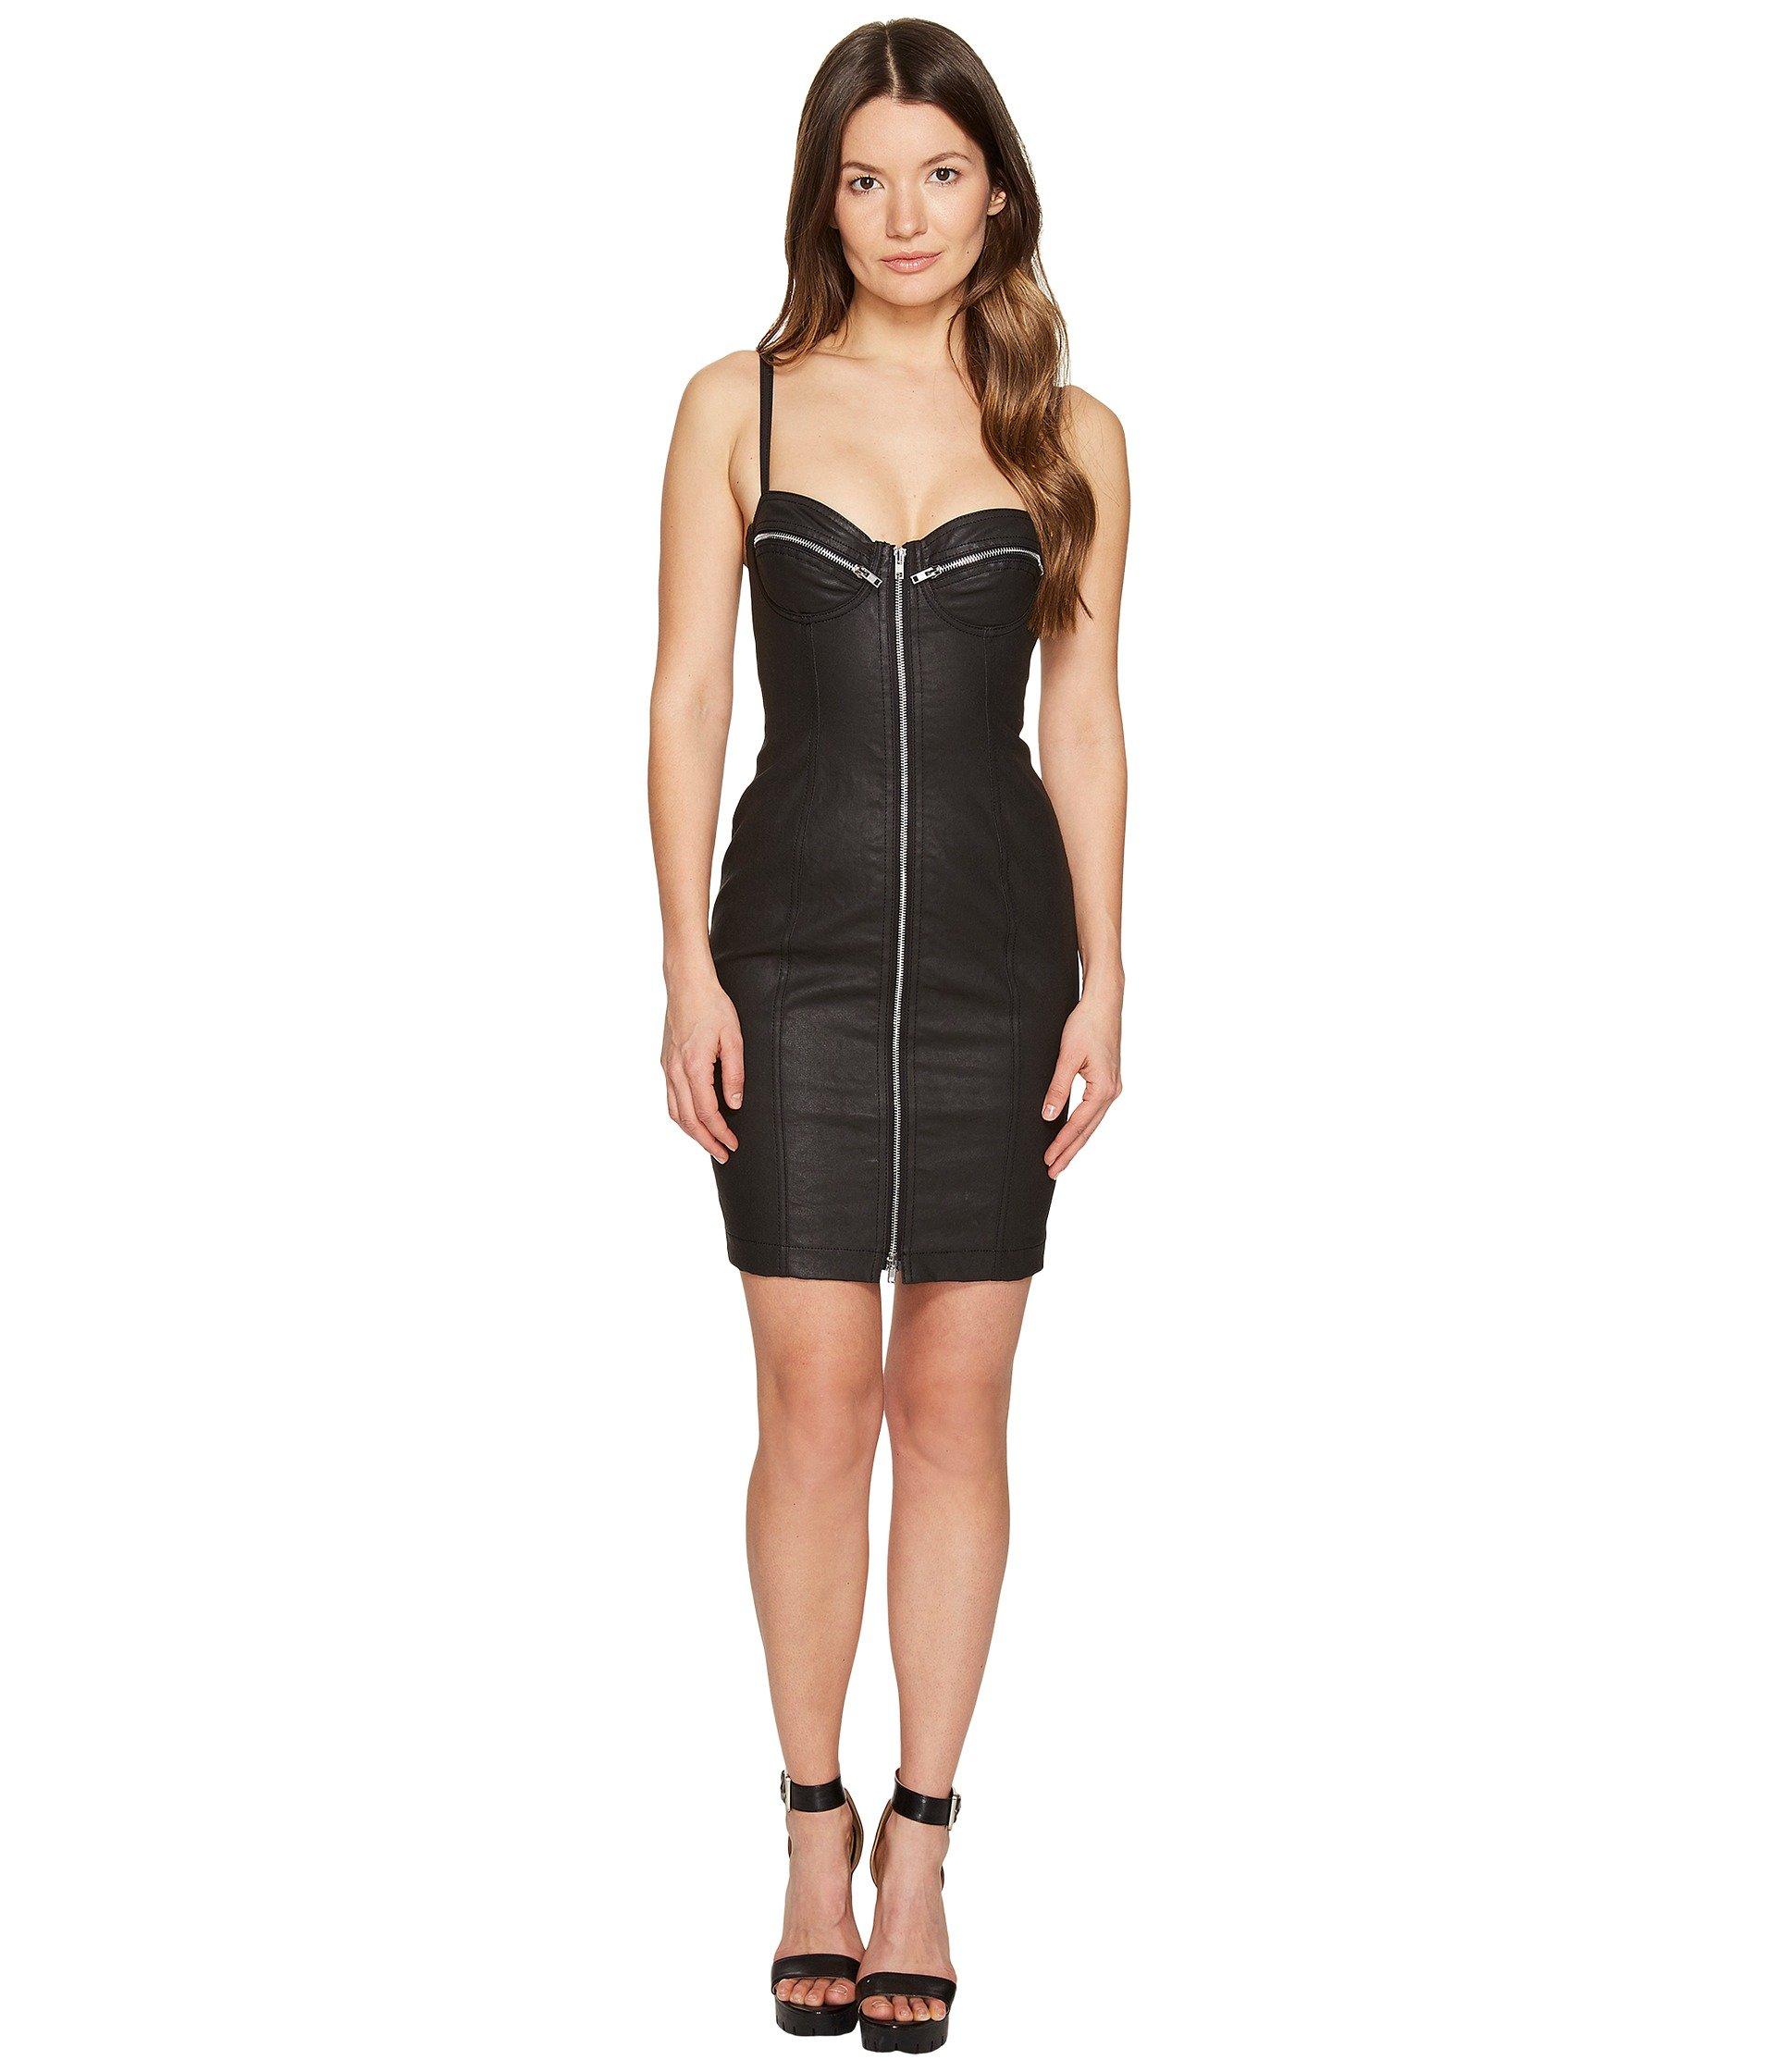 Checkered Zip Dress